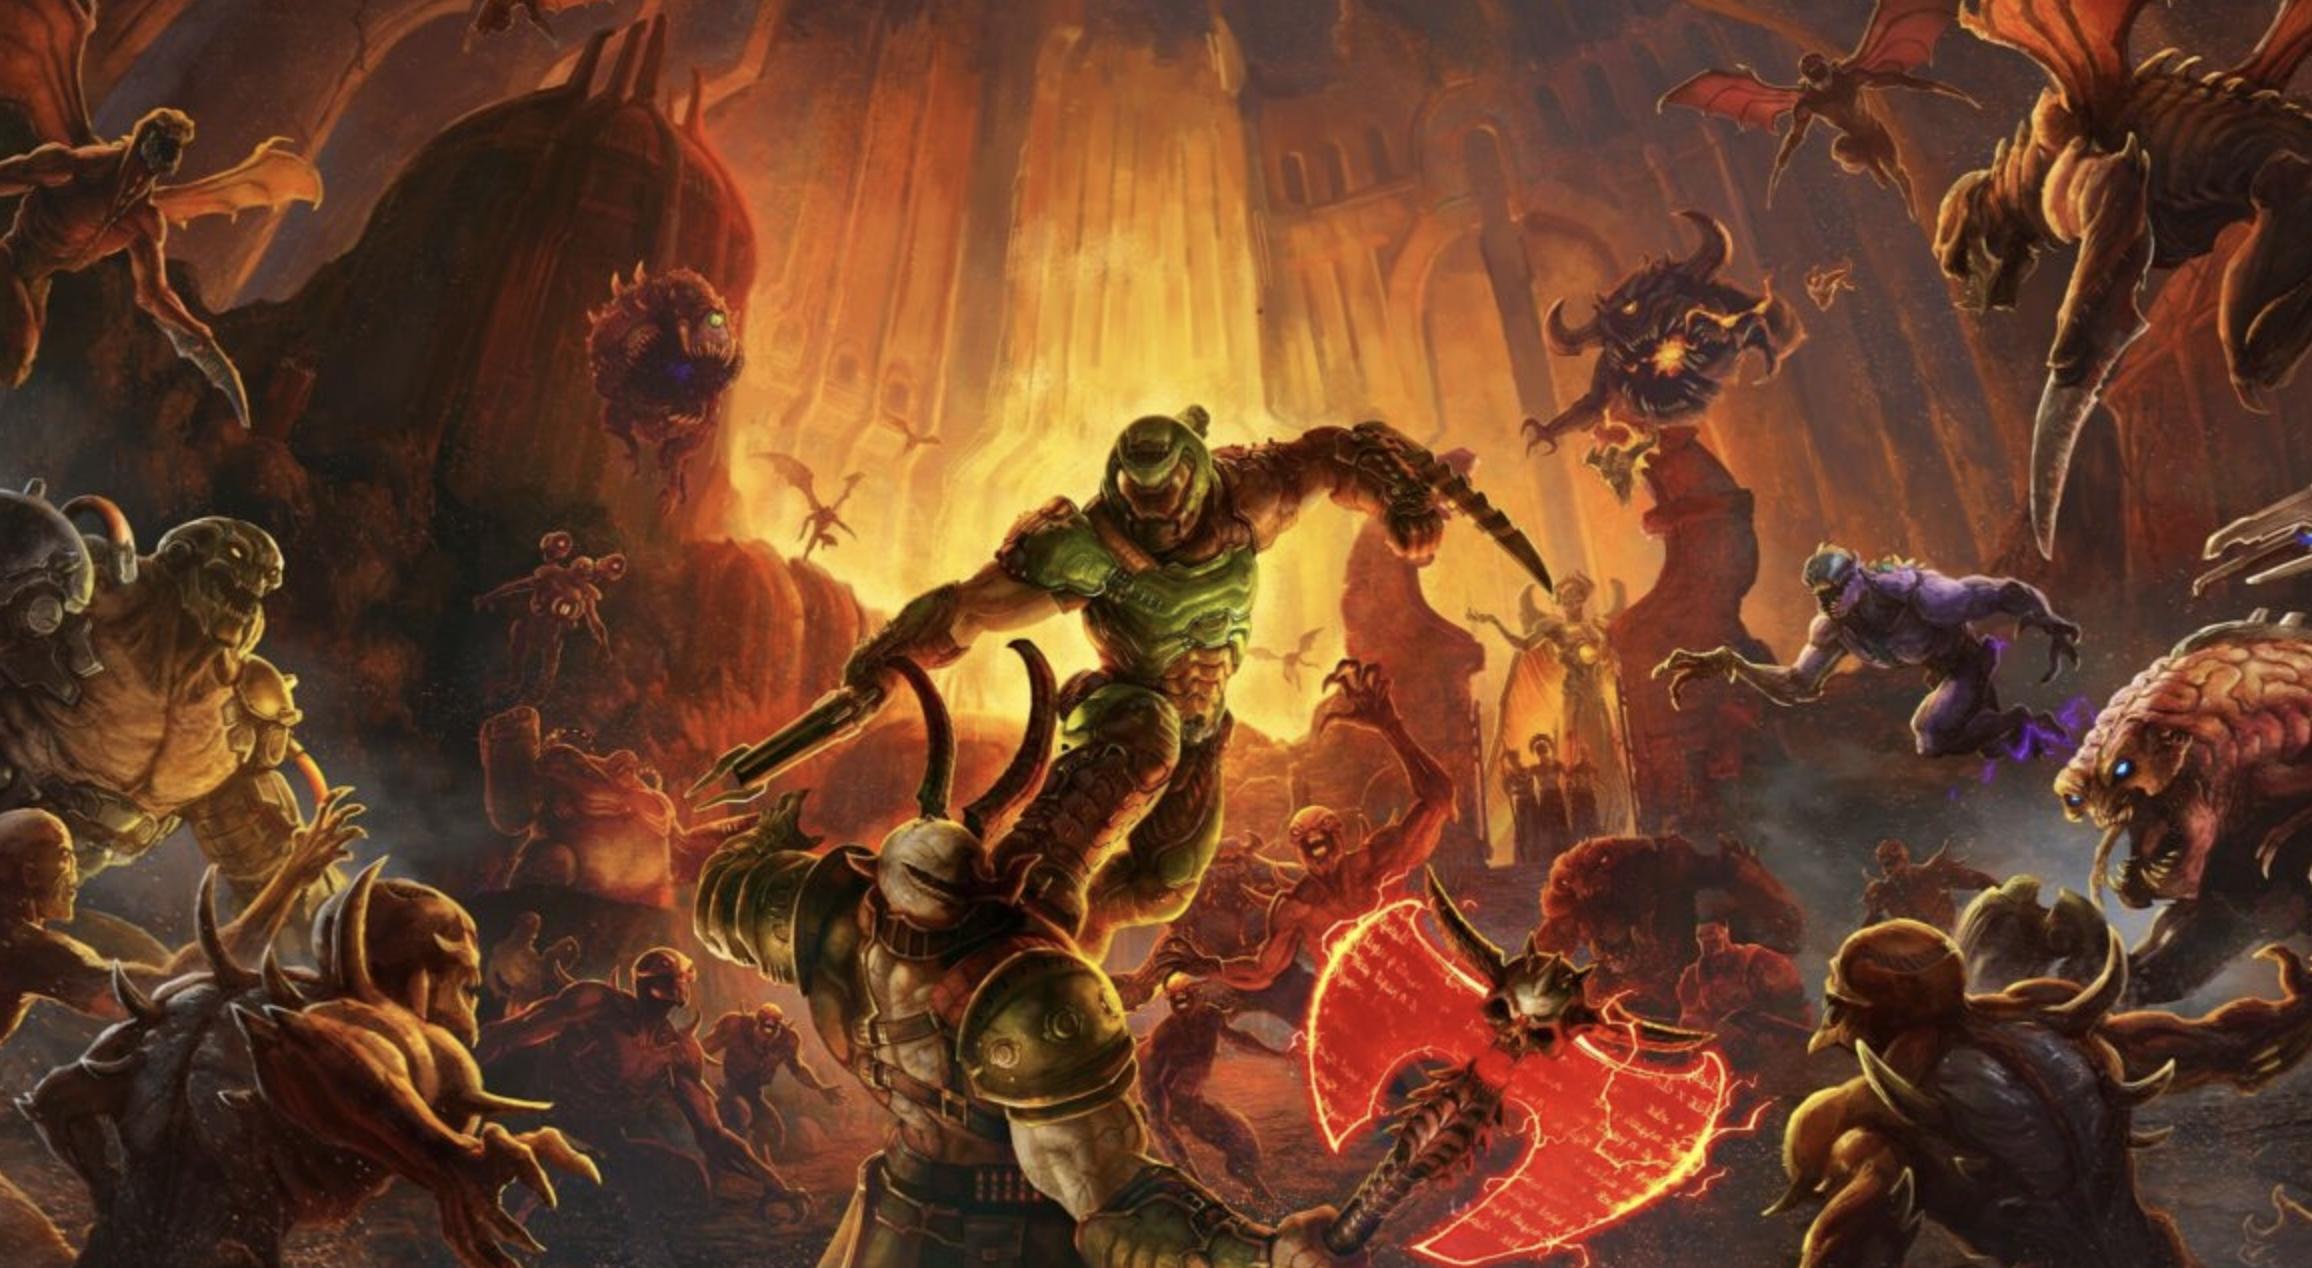 Doom Eternal Update 1.15 Patch Notes